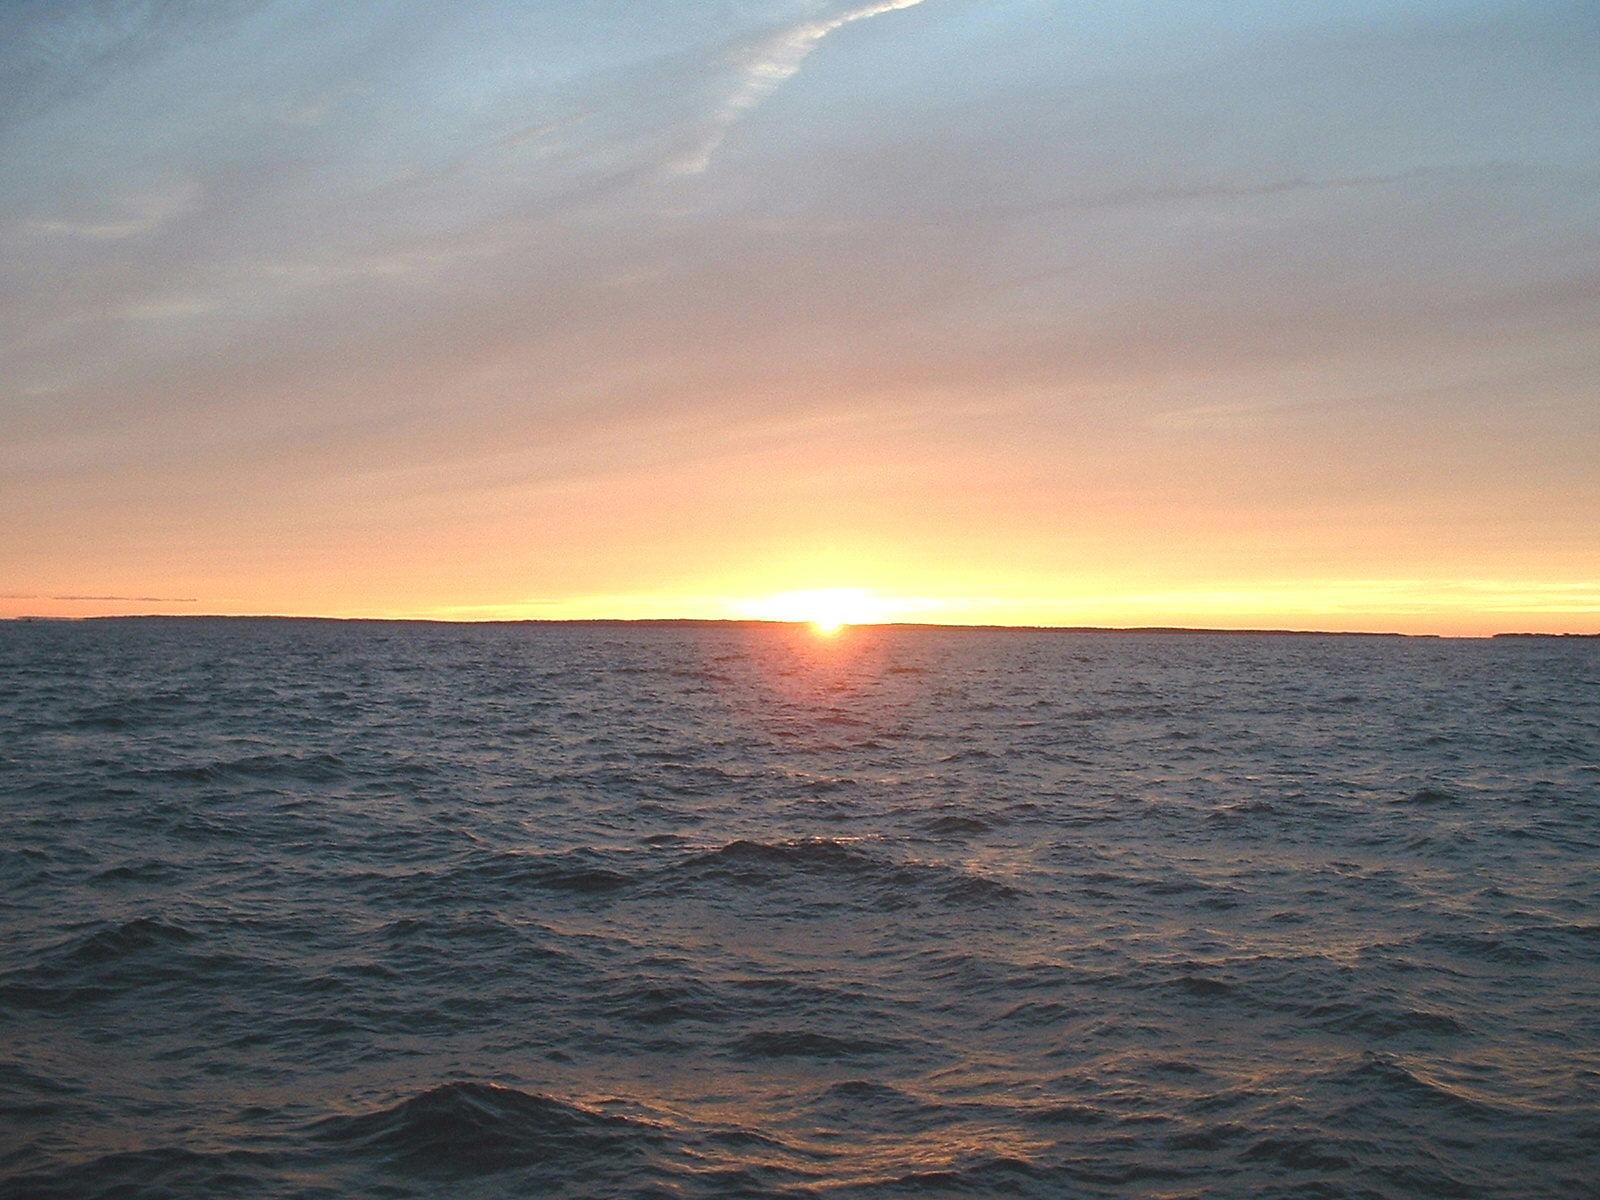 Cape Cod Sunset 1600x1200